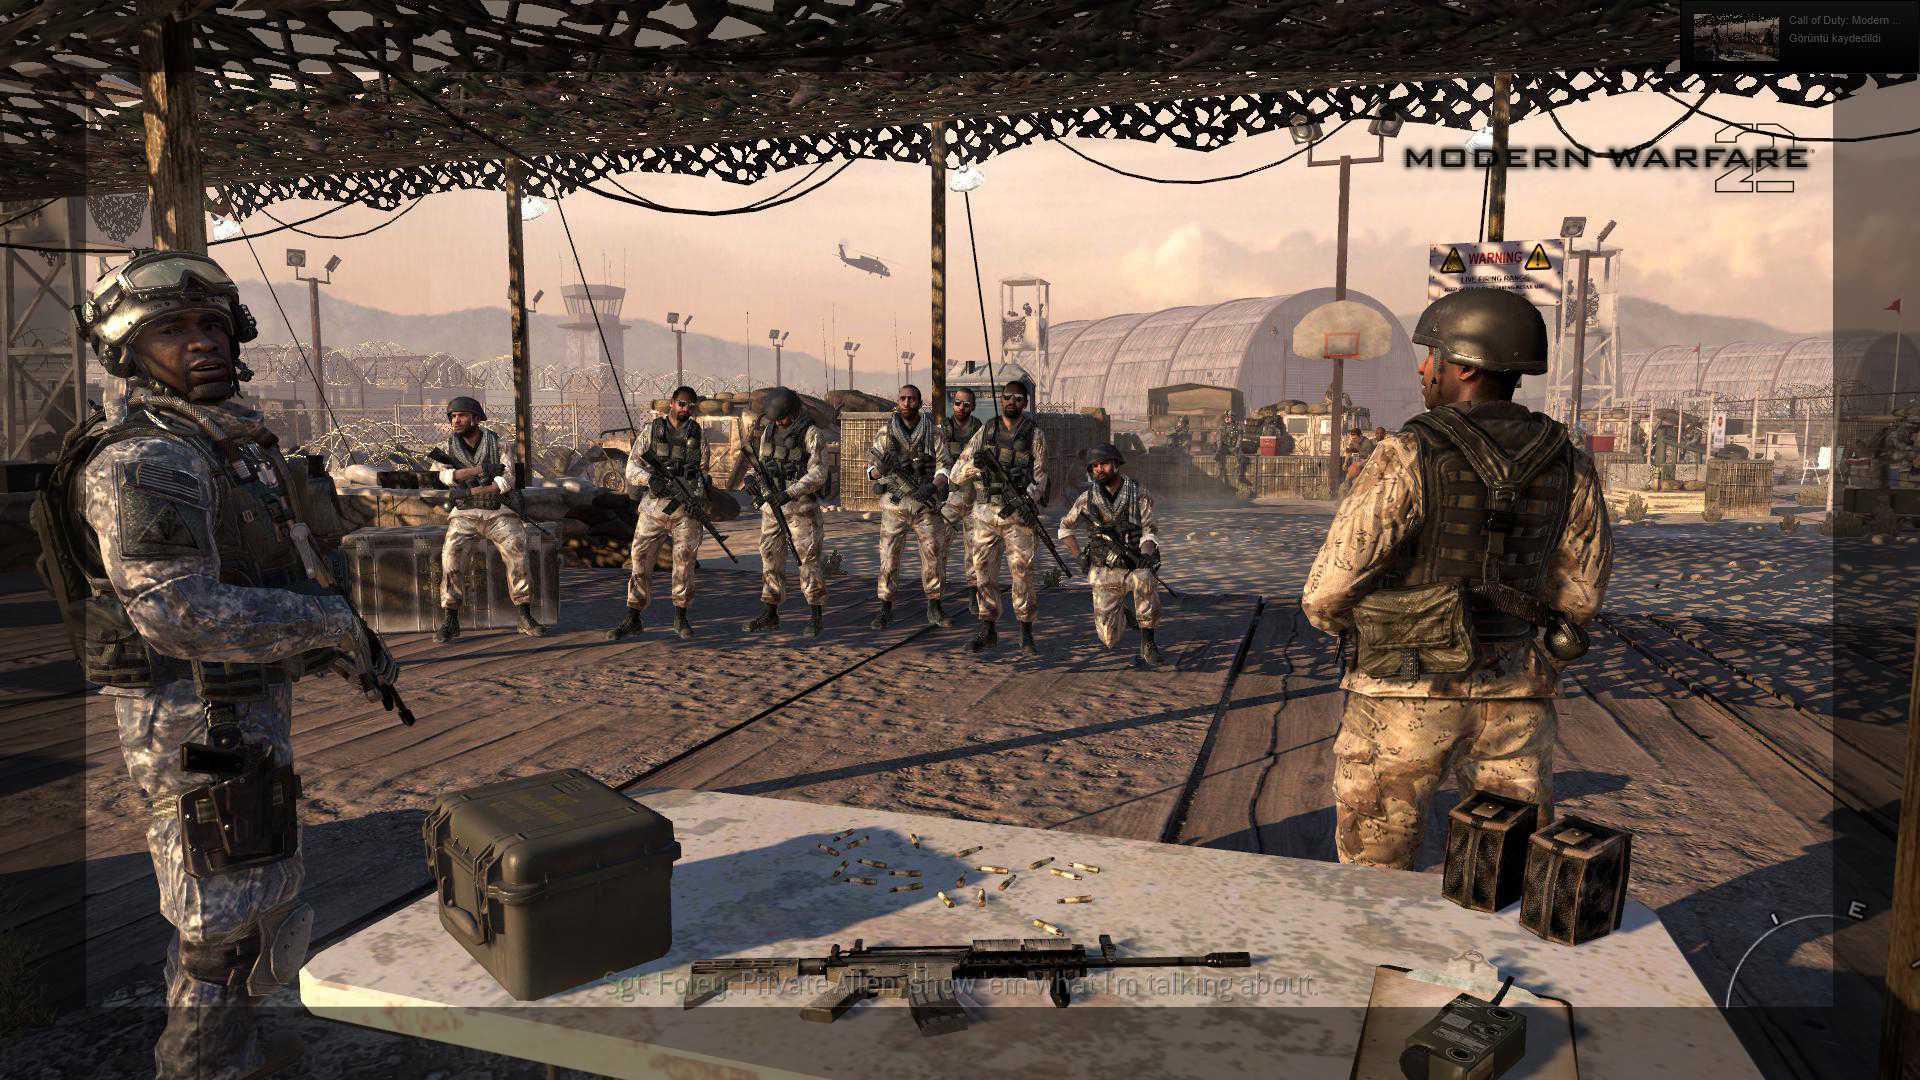 Modern Warfare 2 iw4sp.exe Has Stopped Working Error